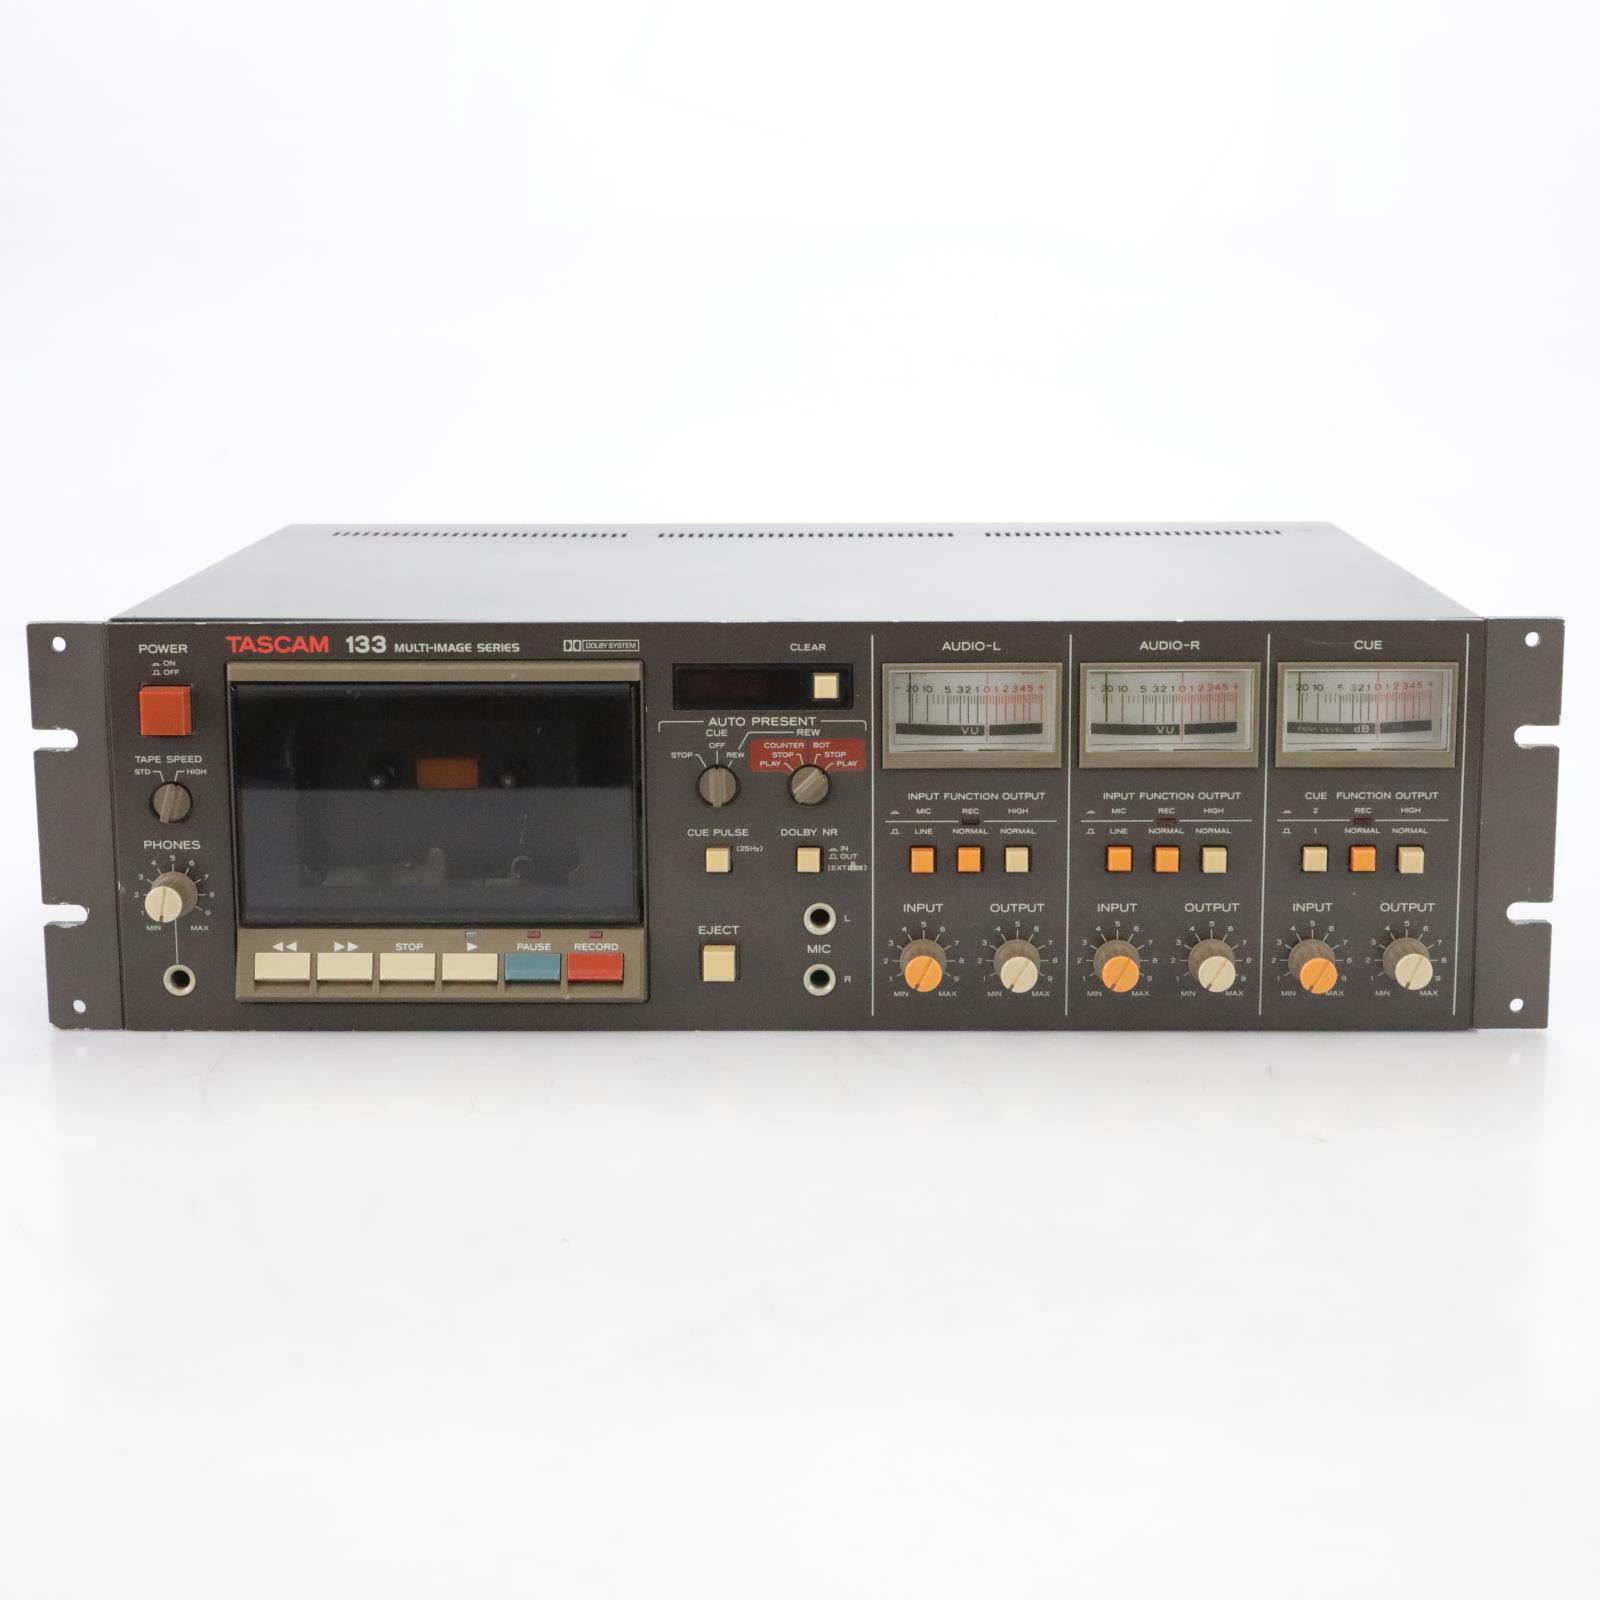 Tascam 133-B Multi-Image Series 2-Speed Cassette Deck #44987